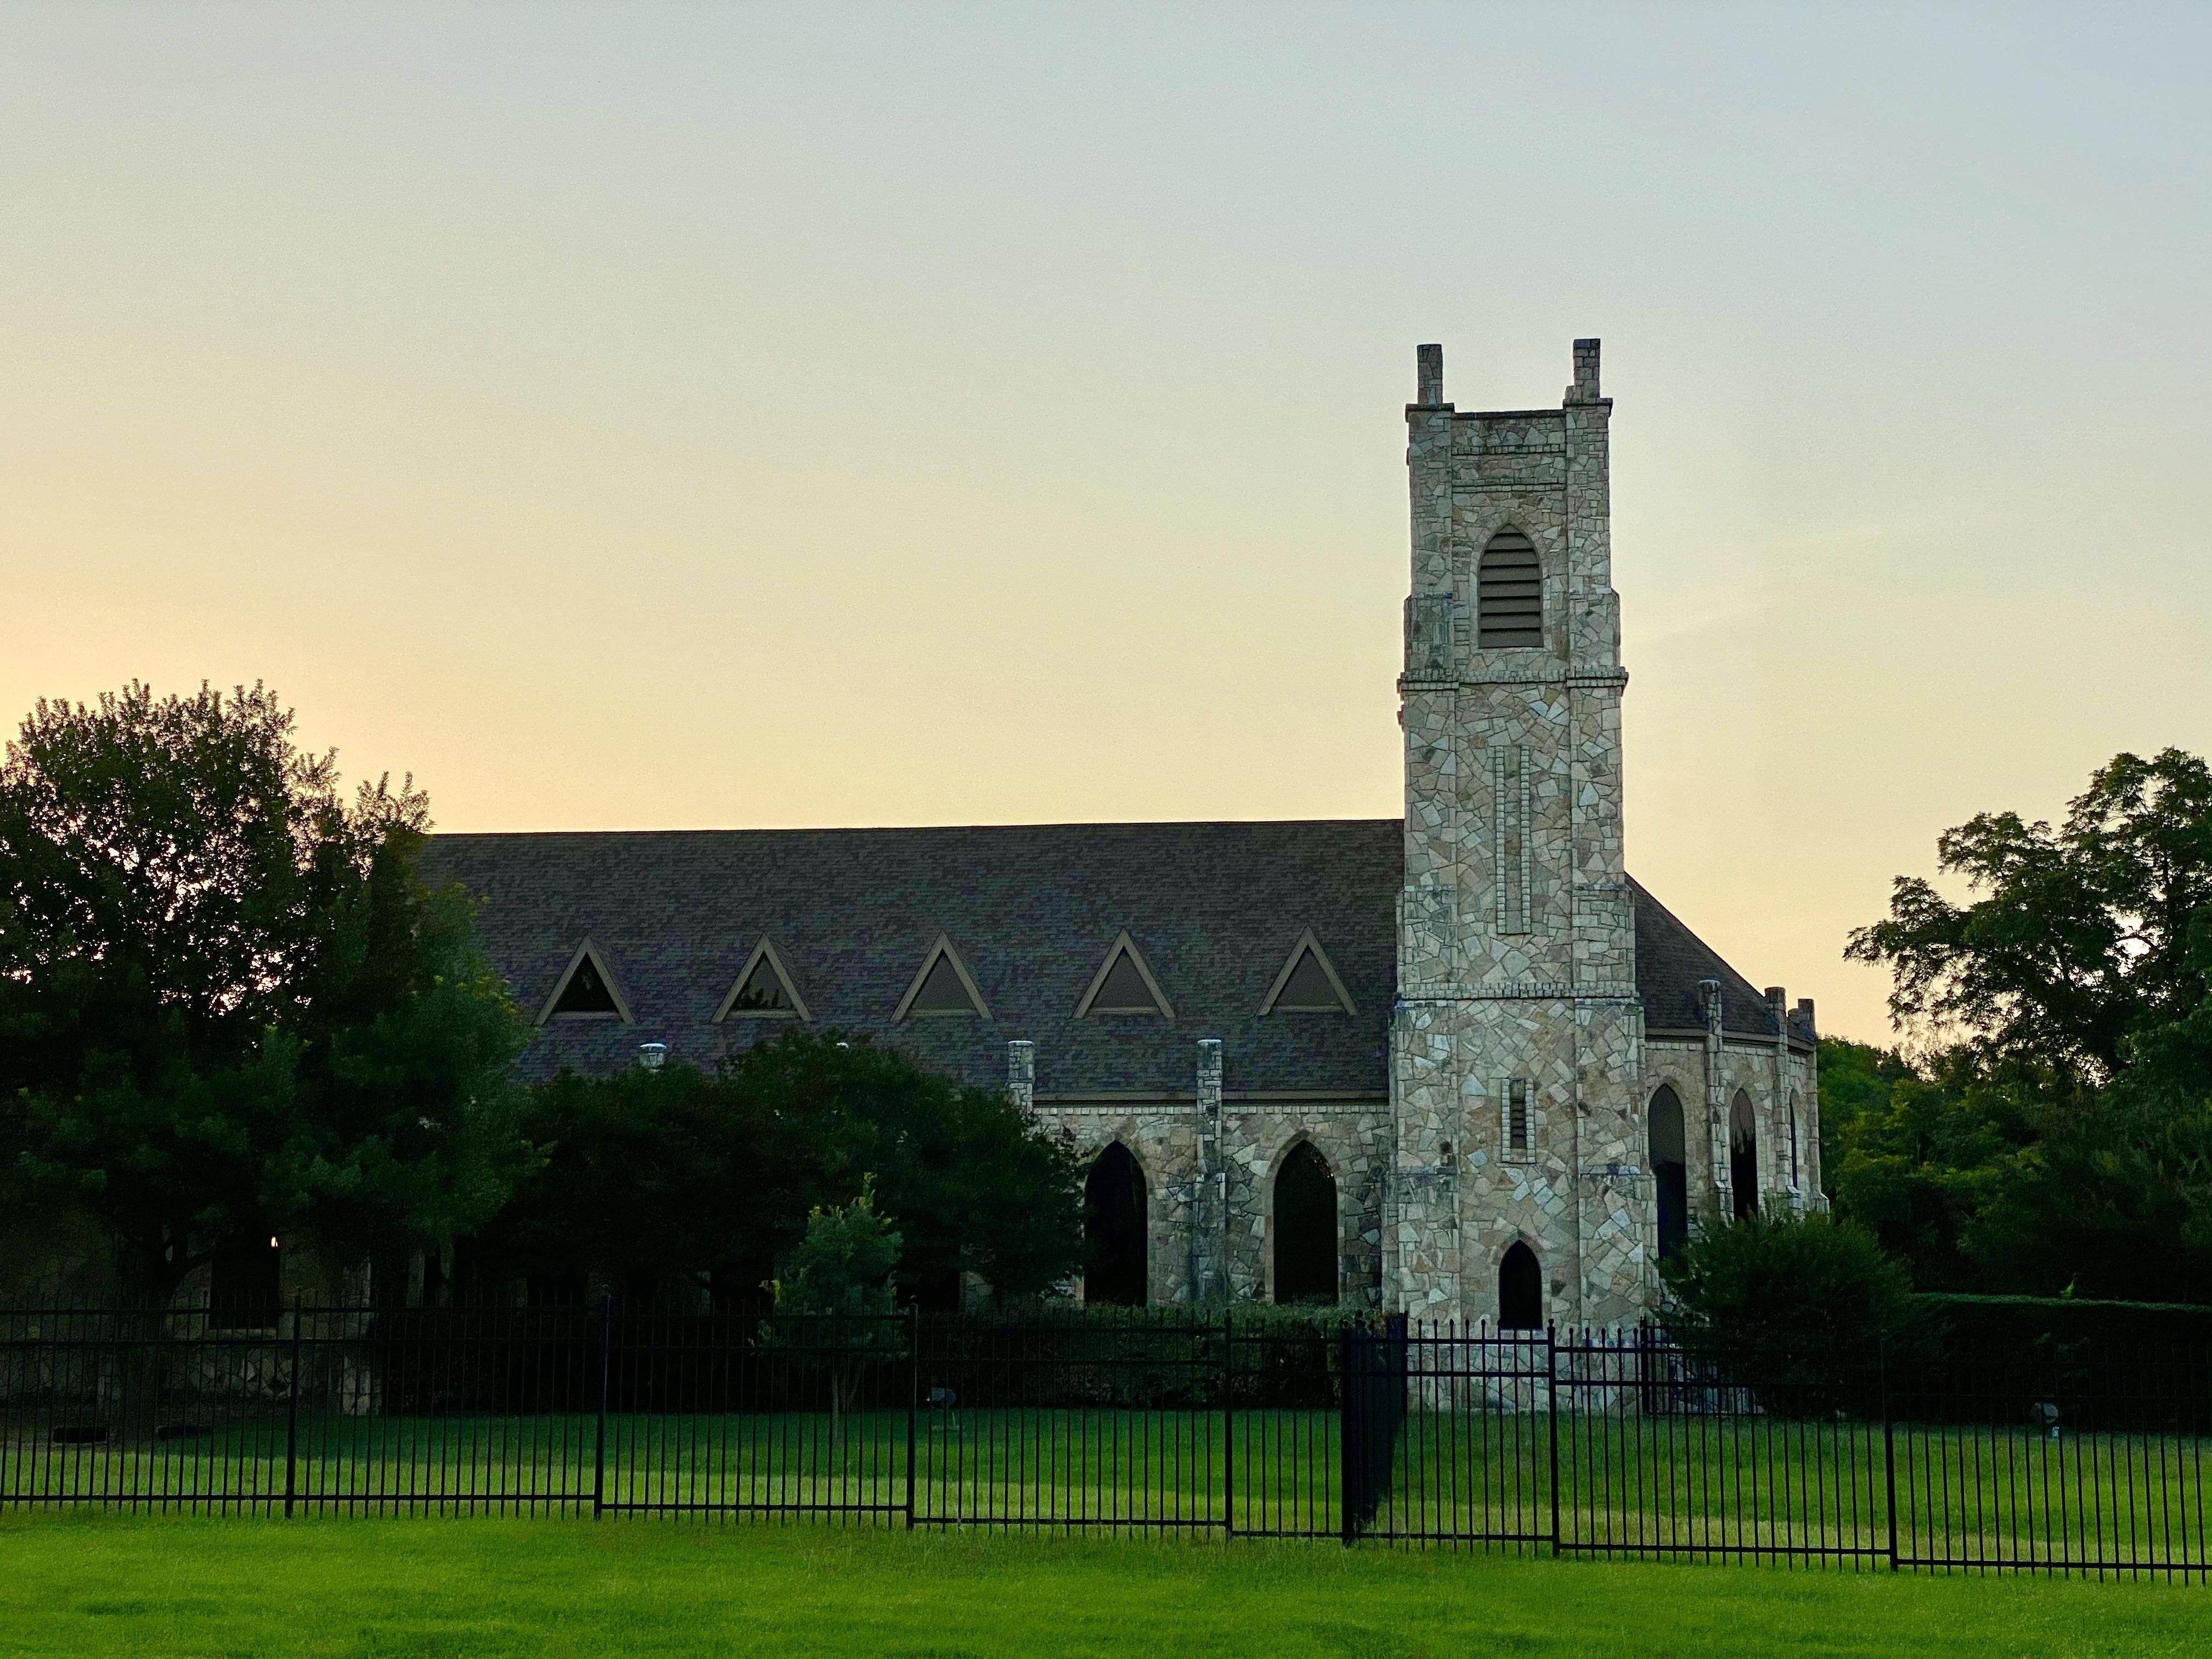 St. James Episcopal Church in Lake Highlands, TX